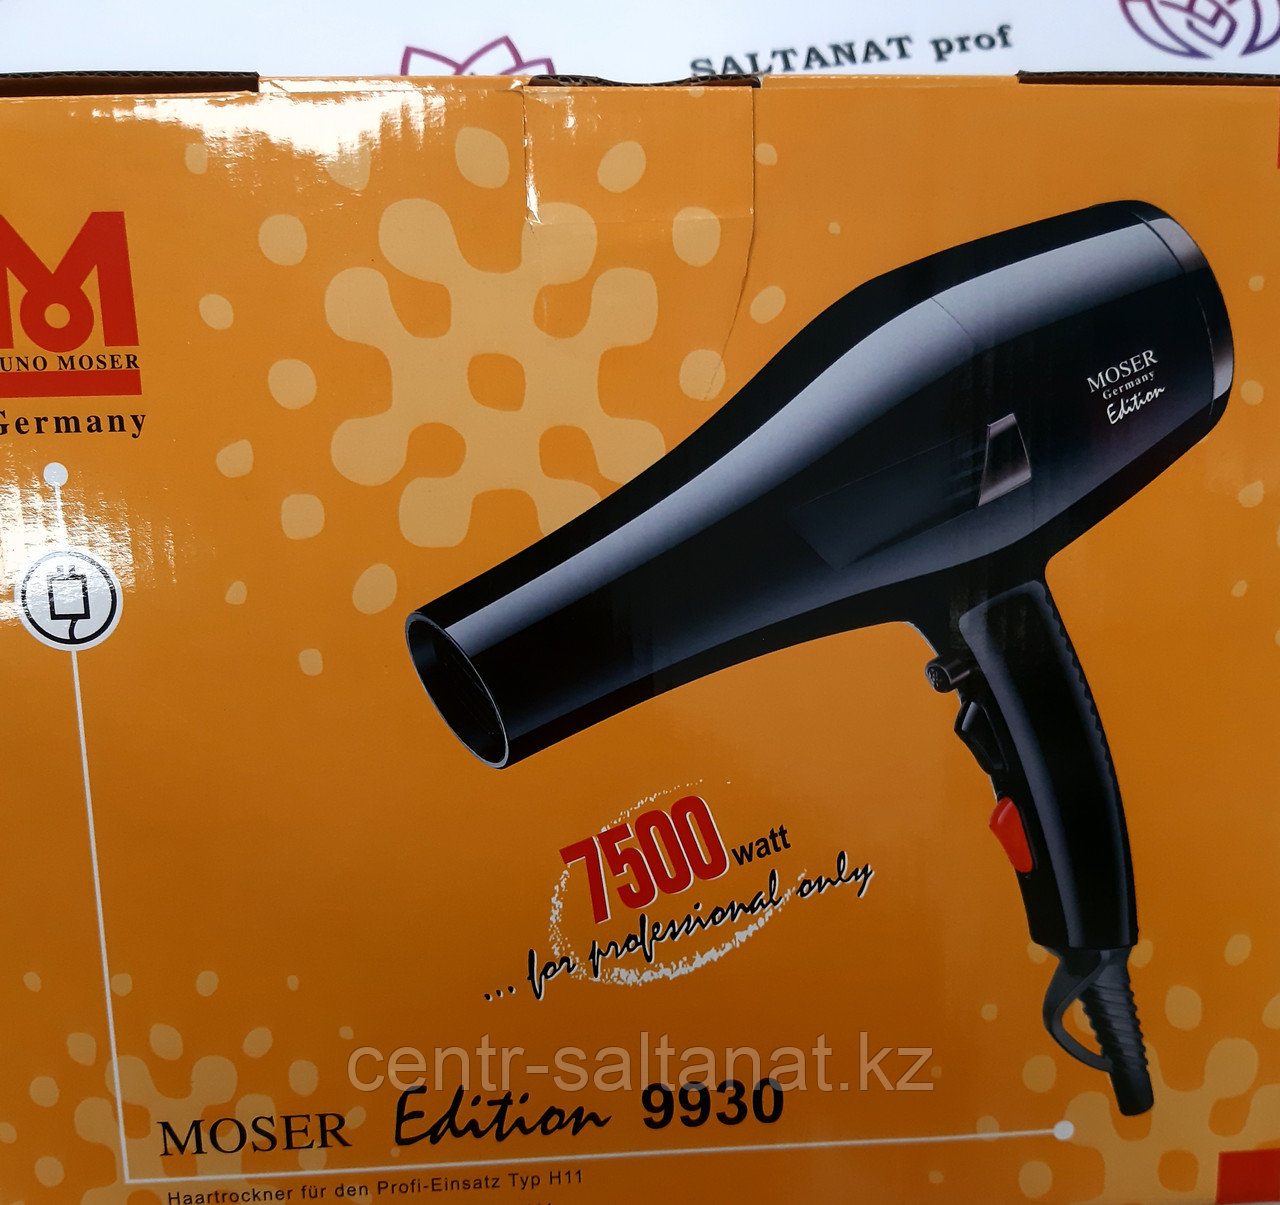 Фен для волос Moser 5000 w